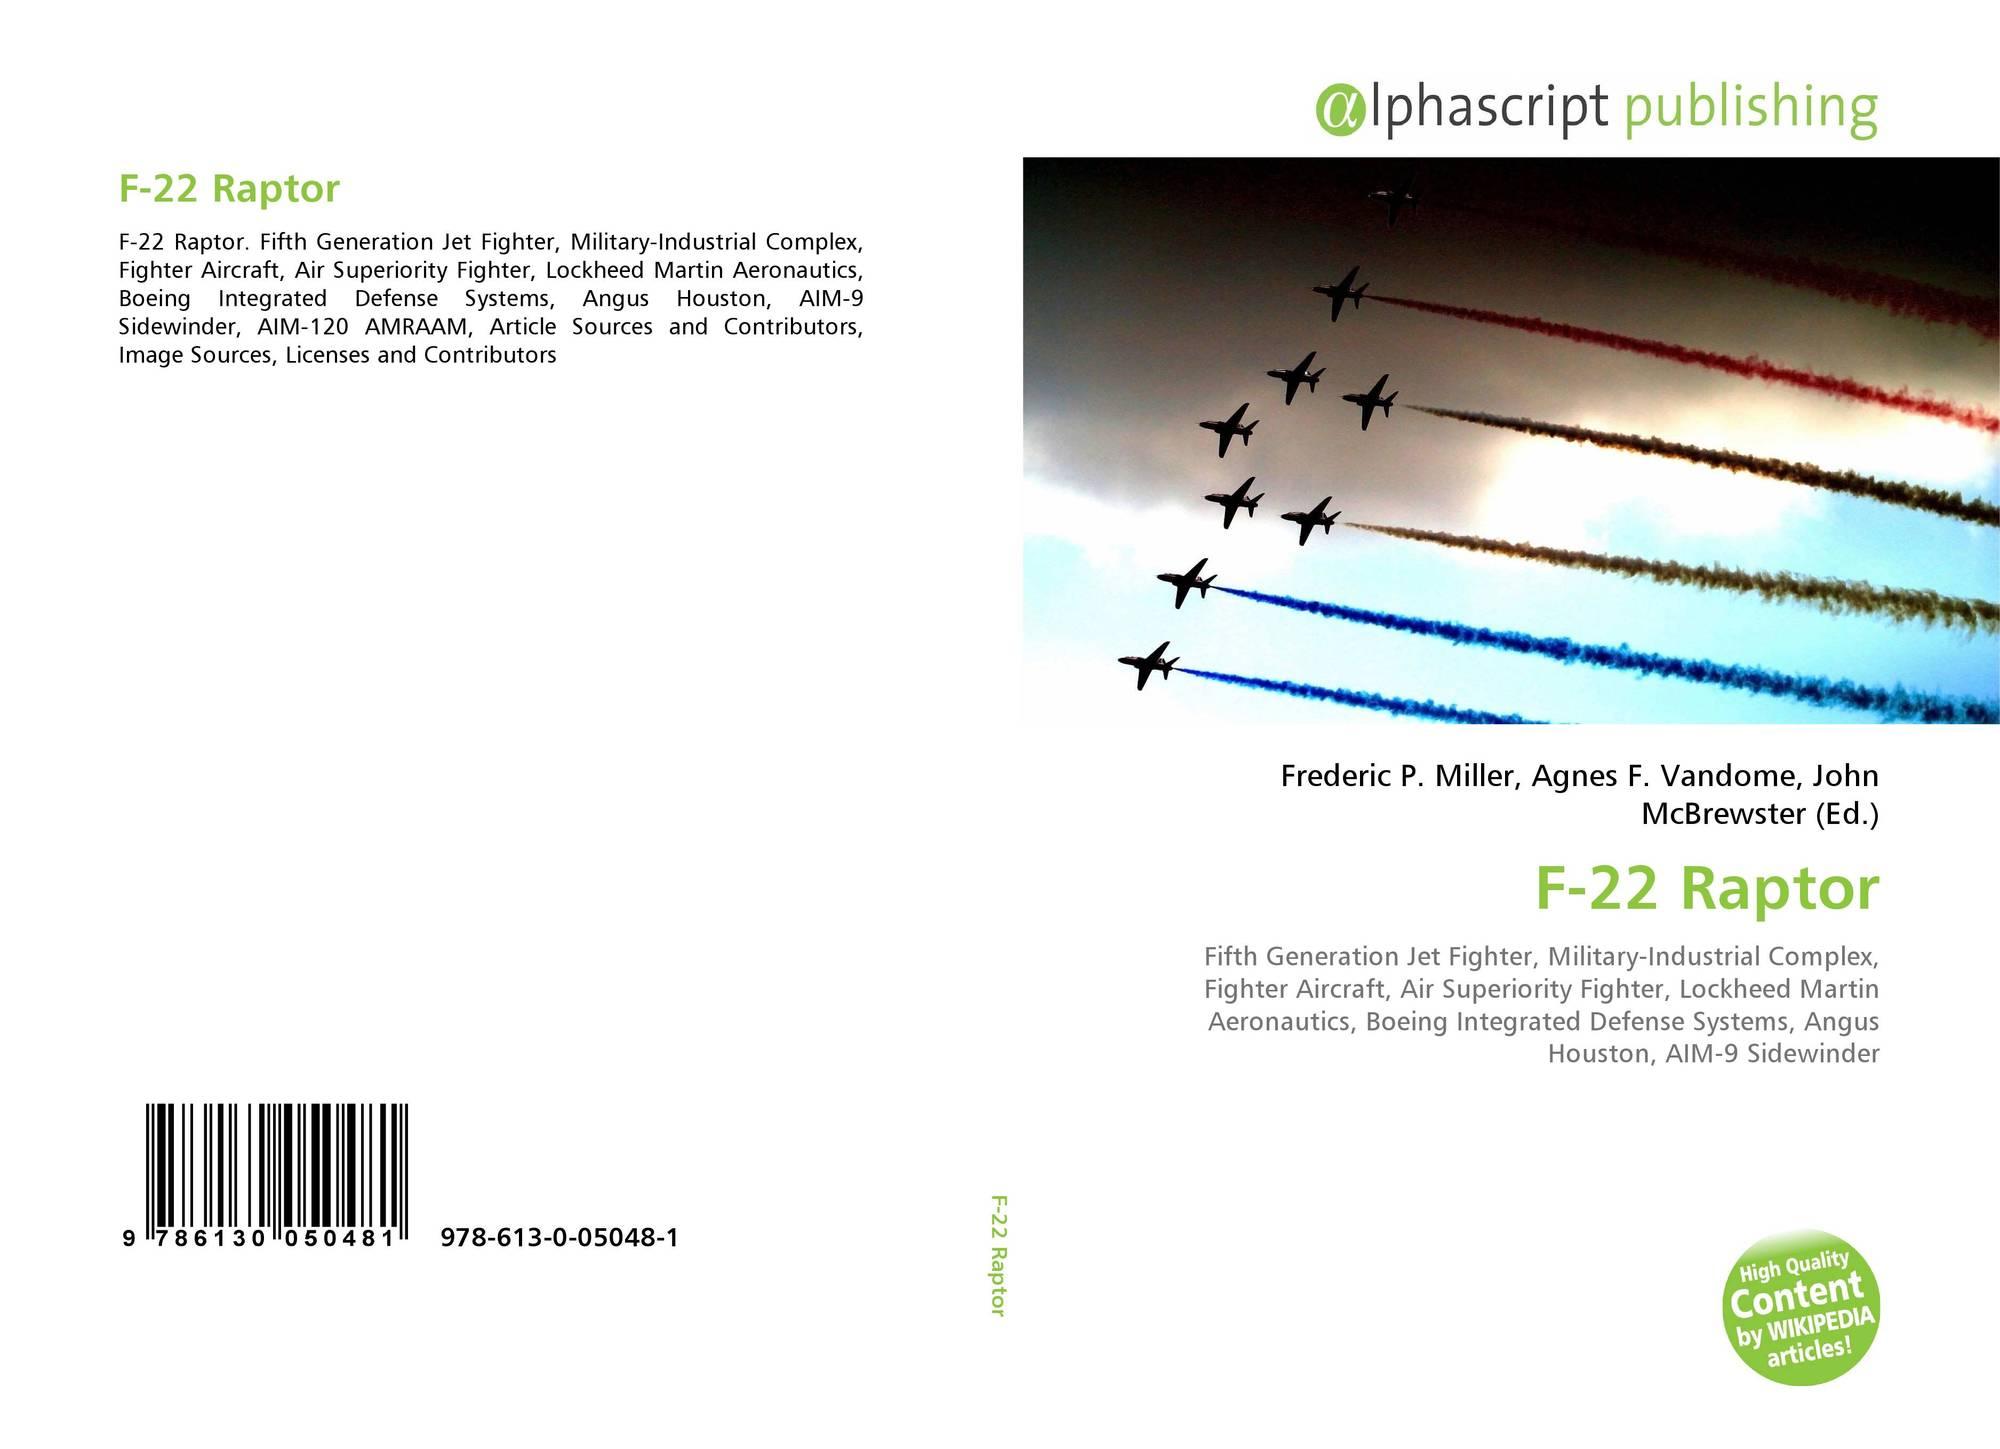 F 22 Raptor 978 613 0 05048 1 6130050488 9786130050481 Wiring Diagram 120